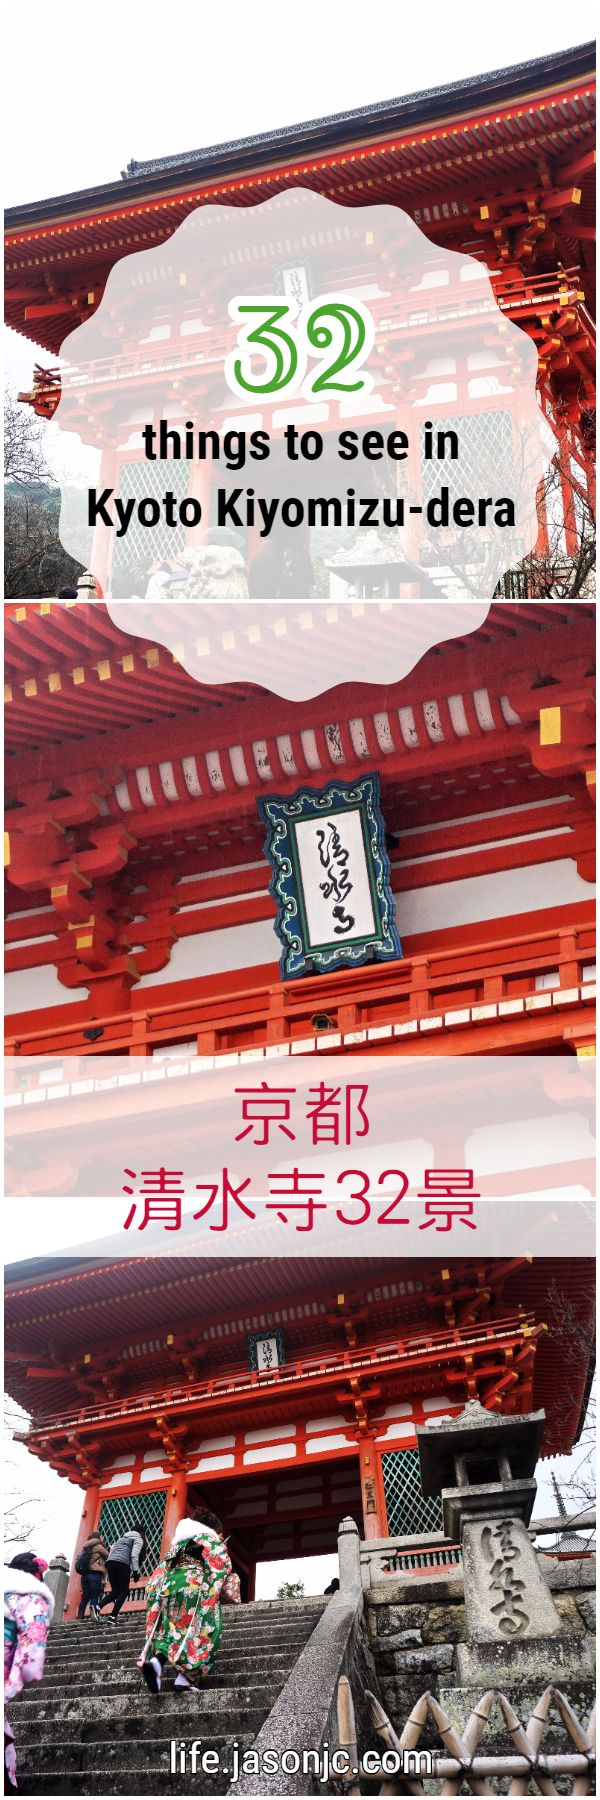 32 things to see in Kiyomizu-dera temple, Kyoto, Japan | 日本京都清水寺必看32景點 | travel.jasonjc.com